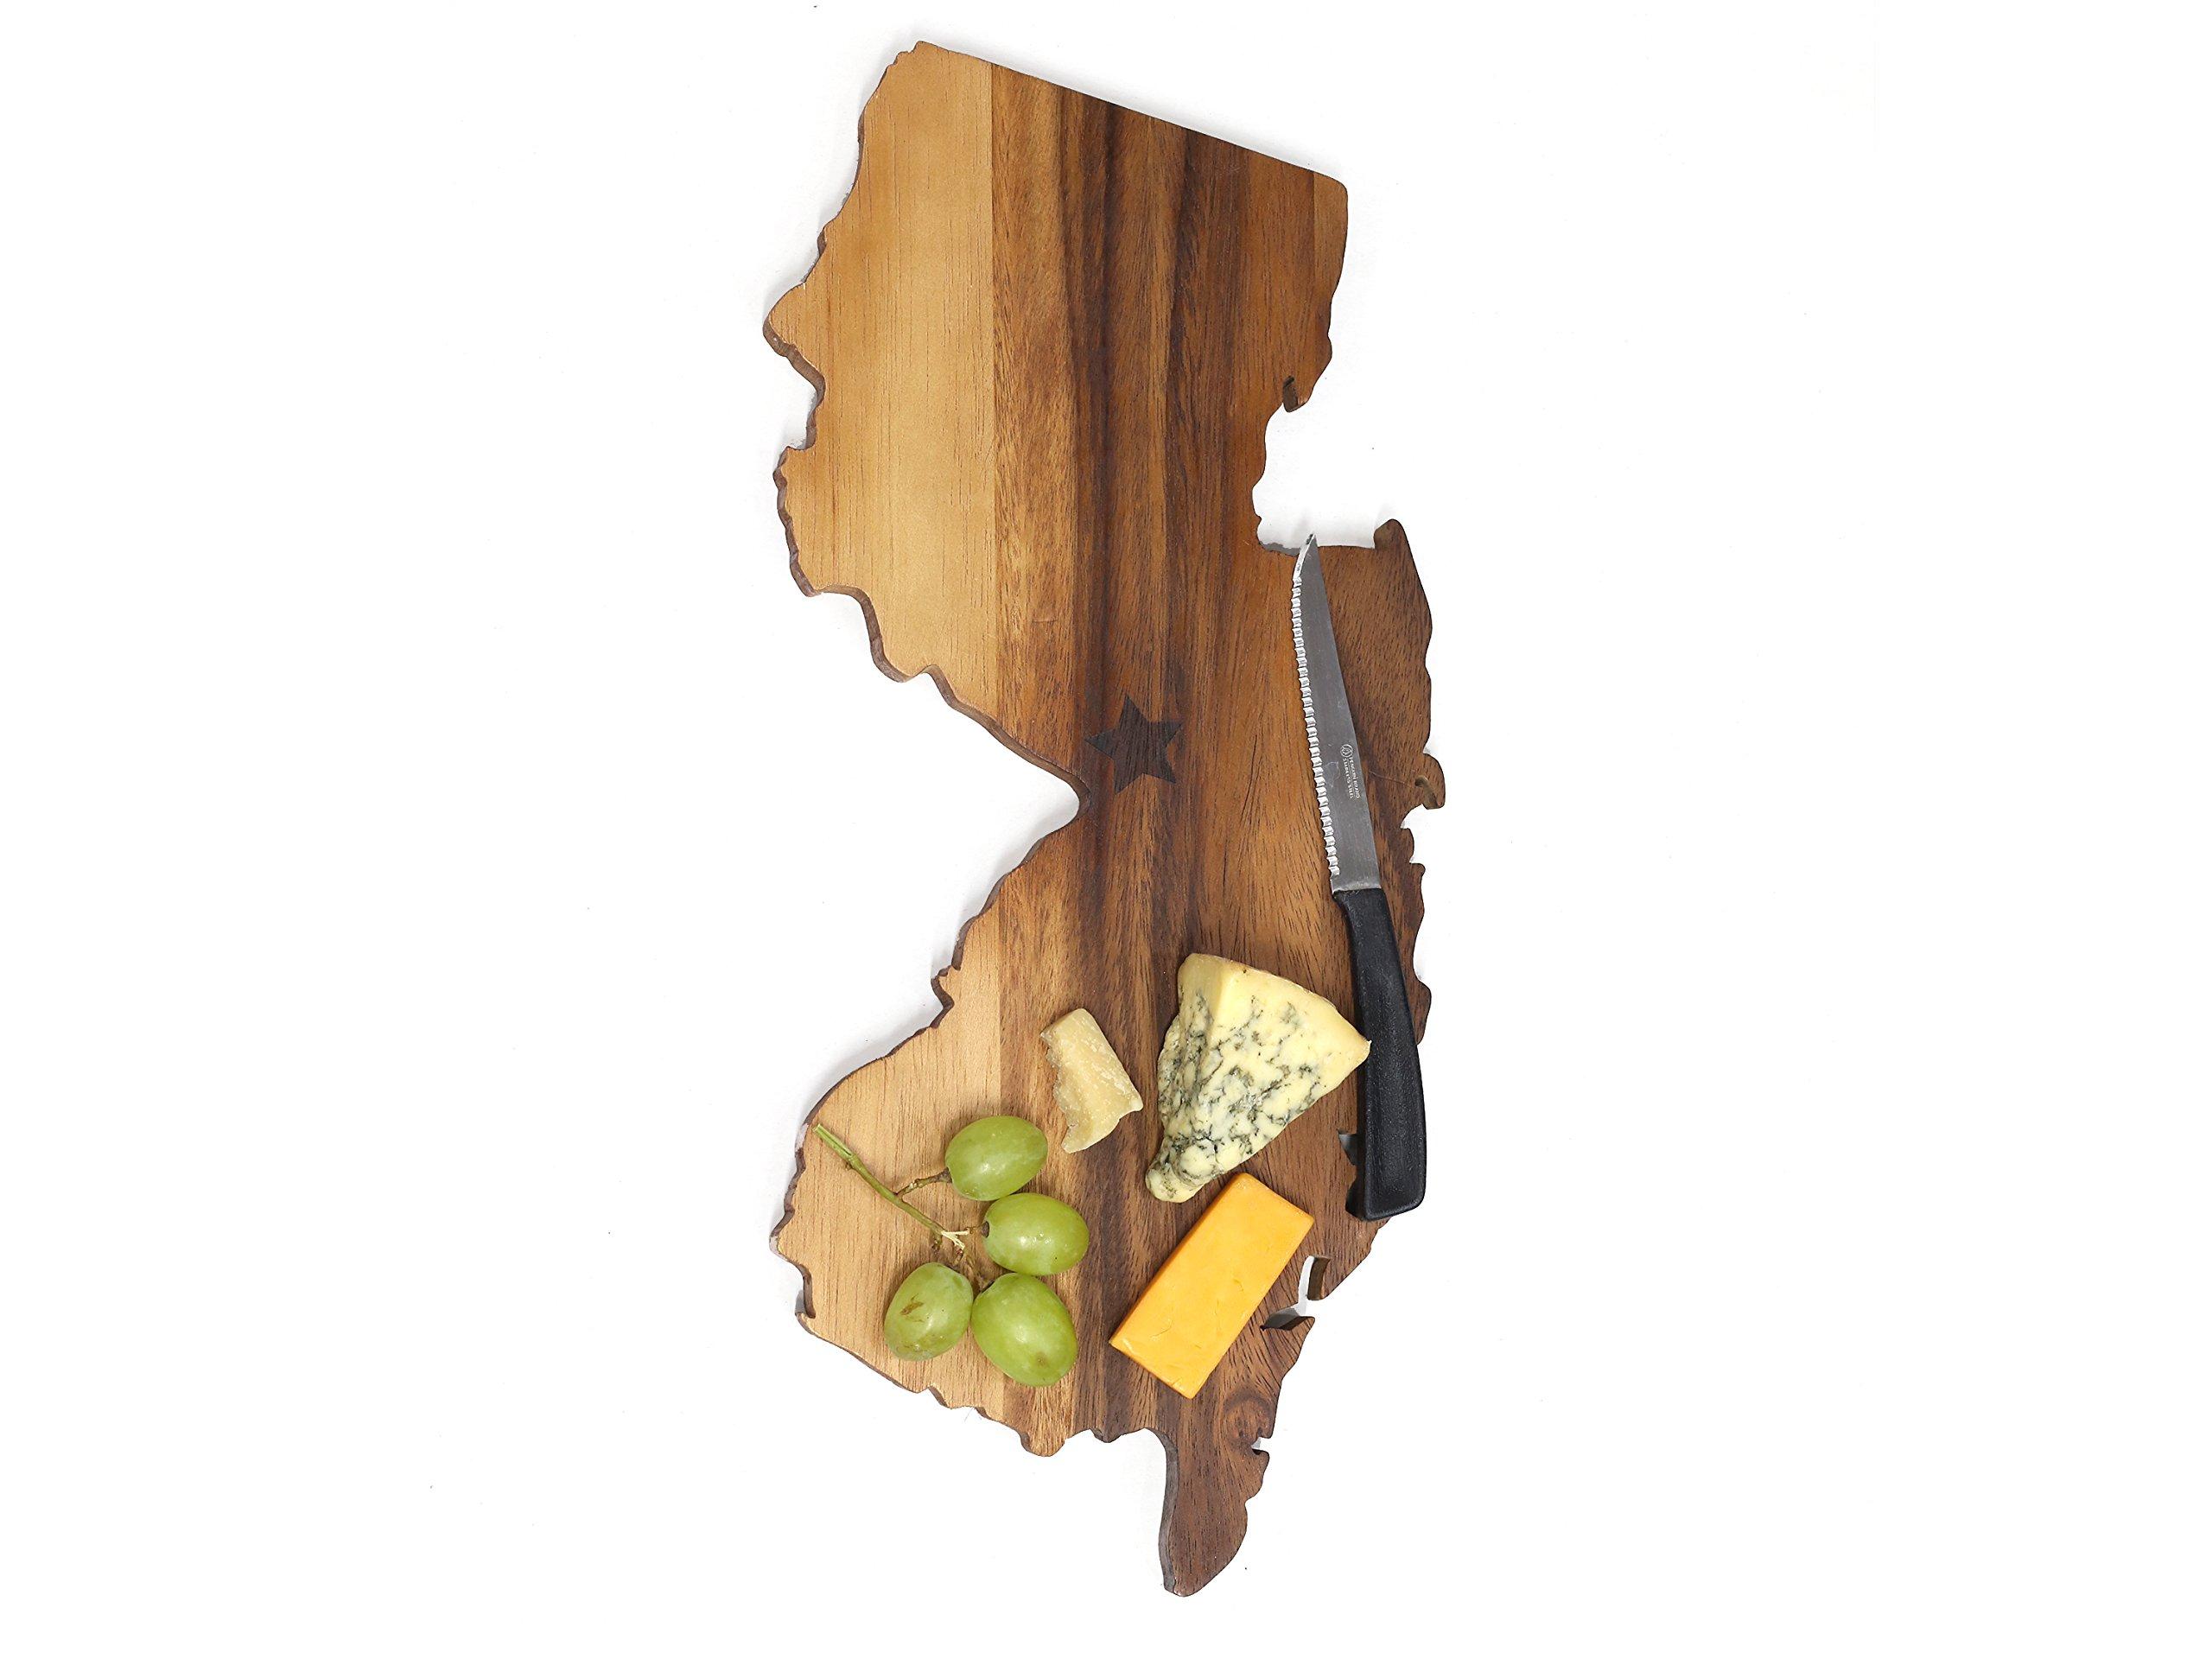 New Jersey Cutting Board: Premium-grade Custom Wooden Chopping or Cheese Board from SiamMandalay by SiamMandalay